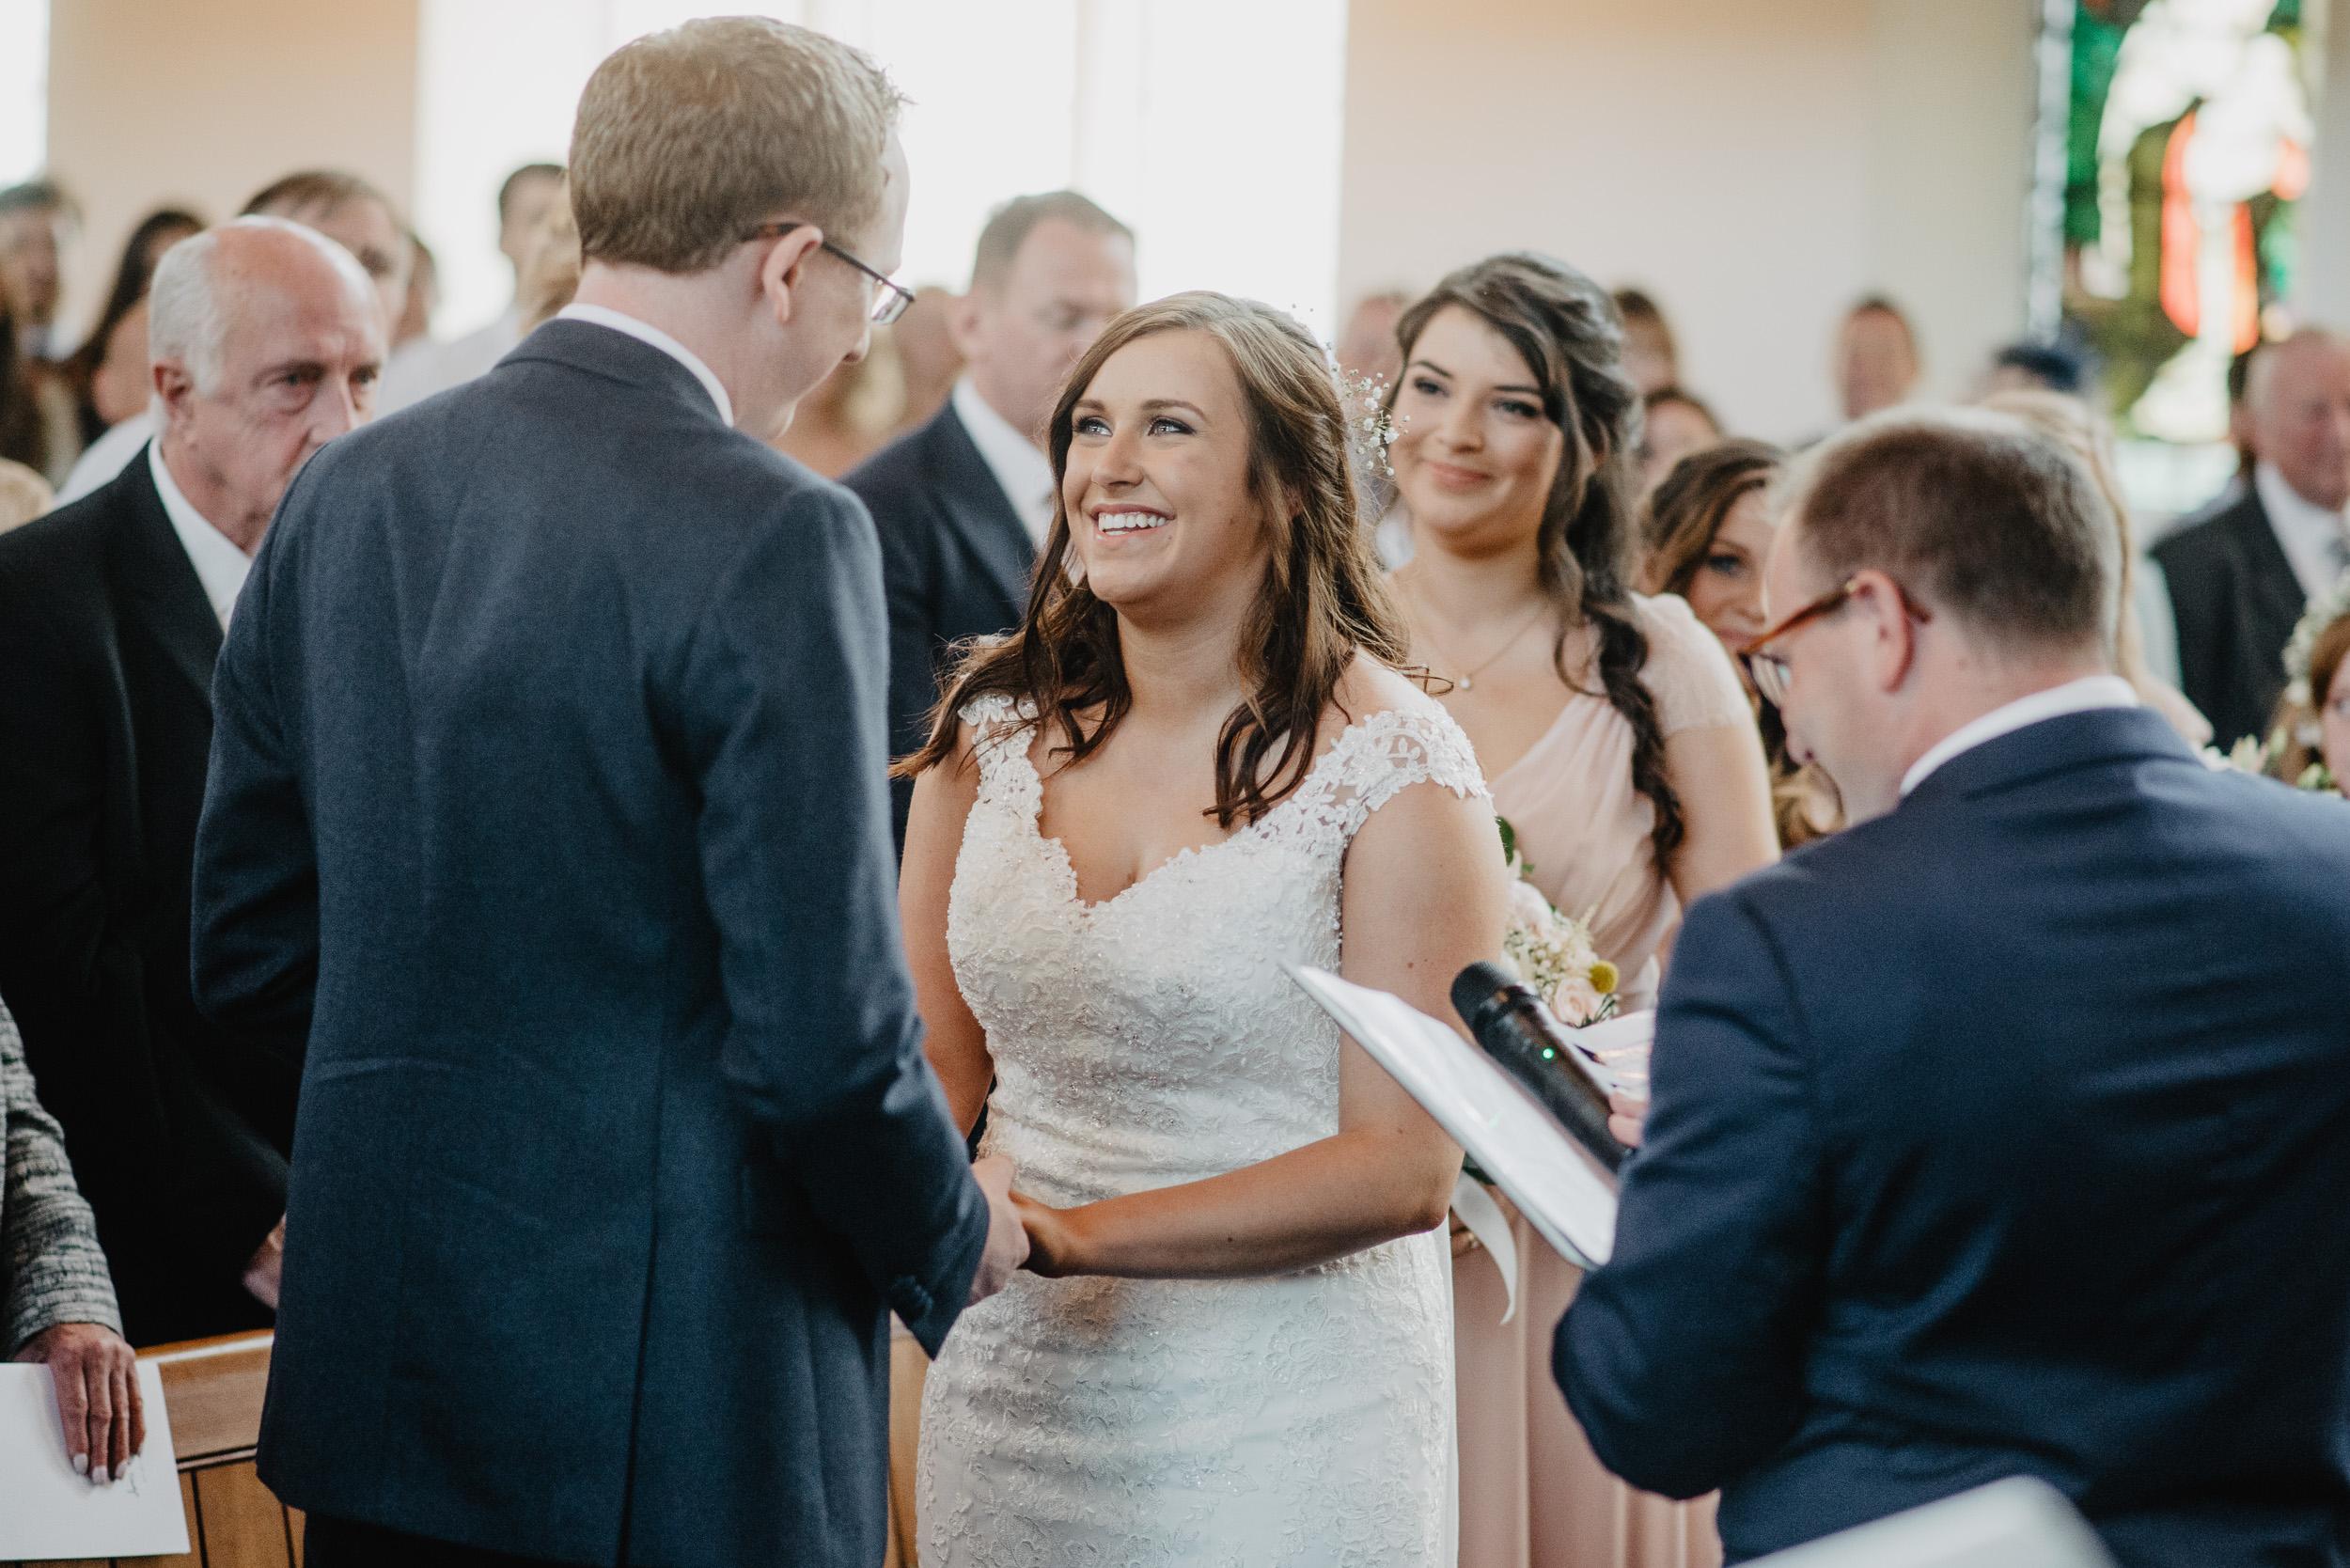 wedding photogaphy peter mackey 2018 beth-6.jpg